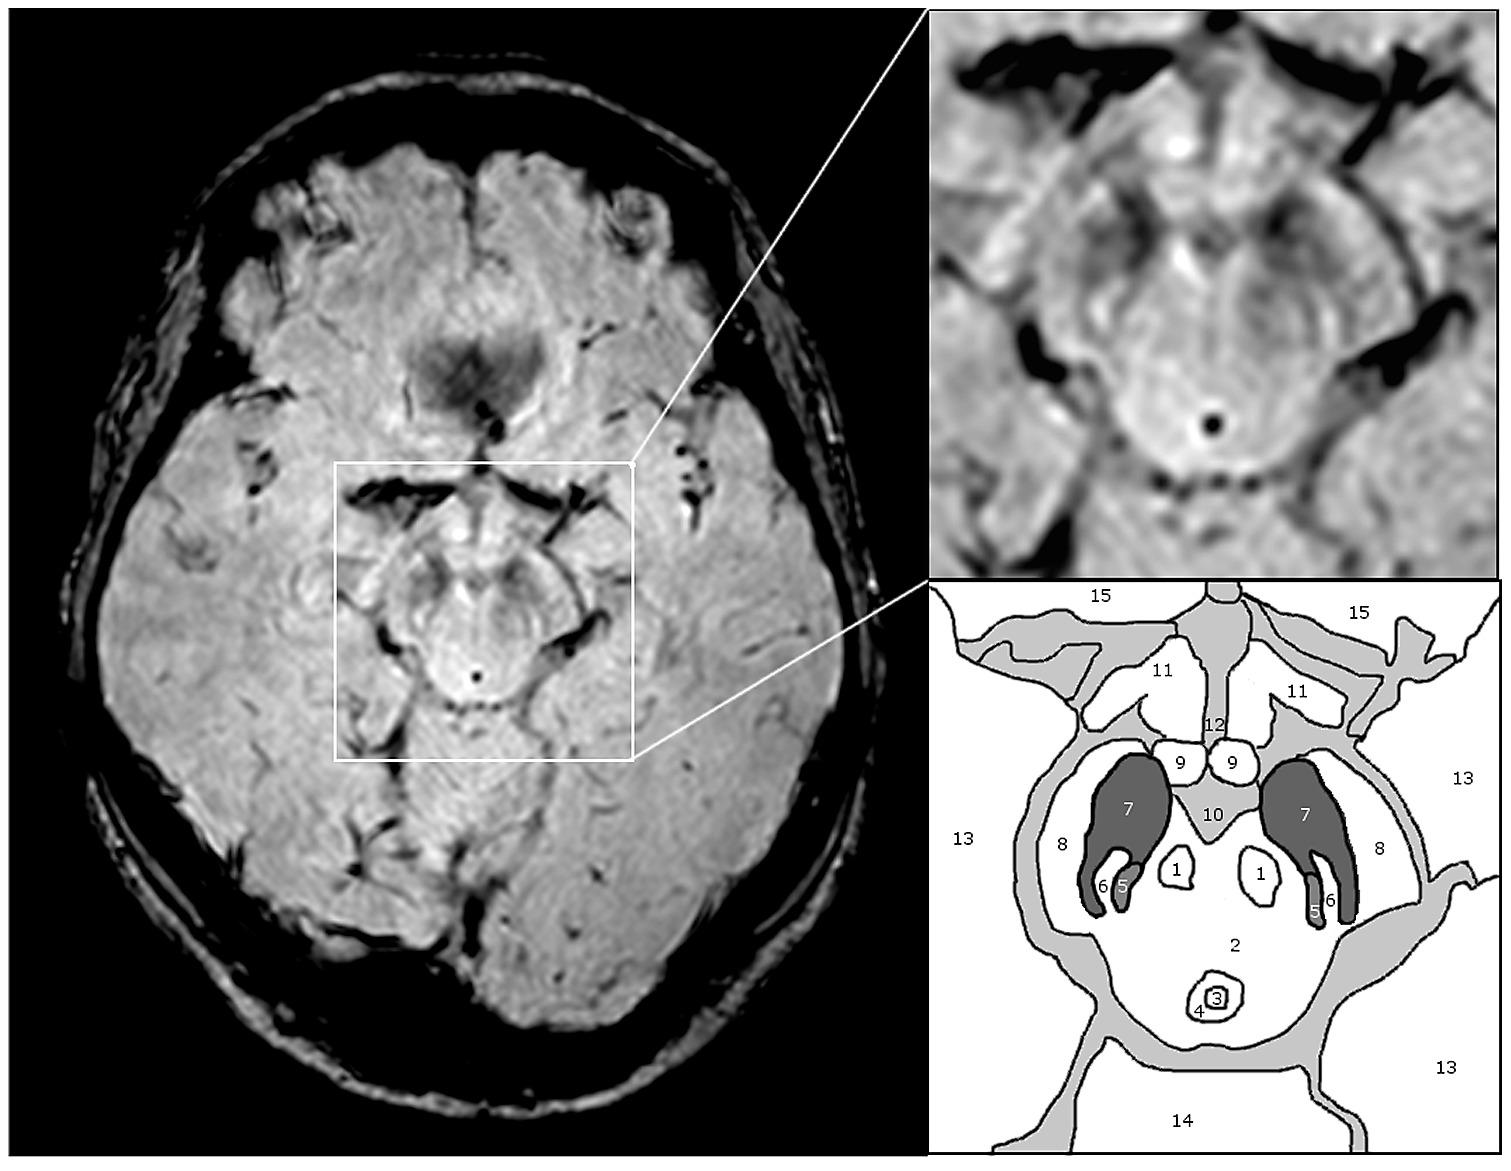 Substantia nigra anatomy on 3T - SWI – MRI.